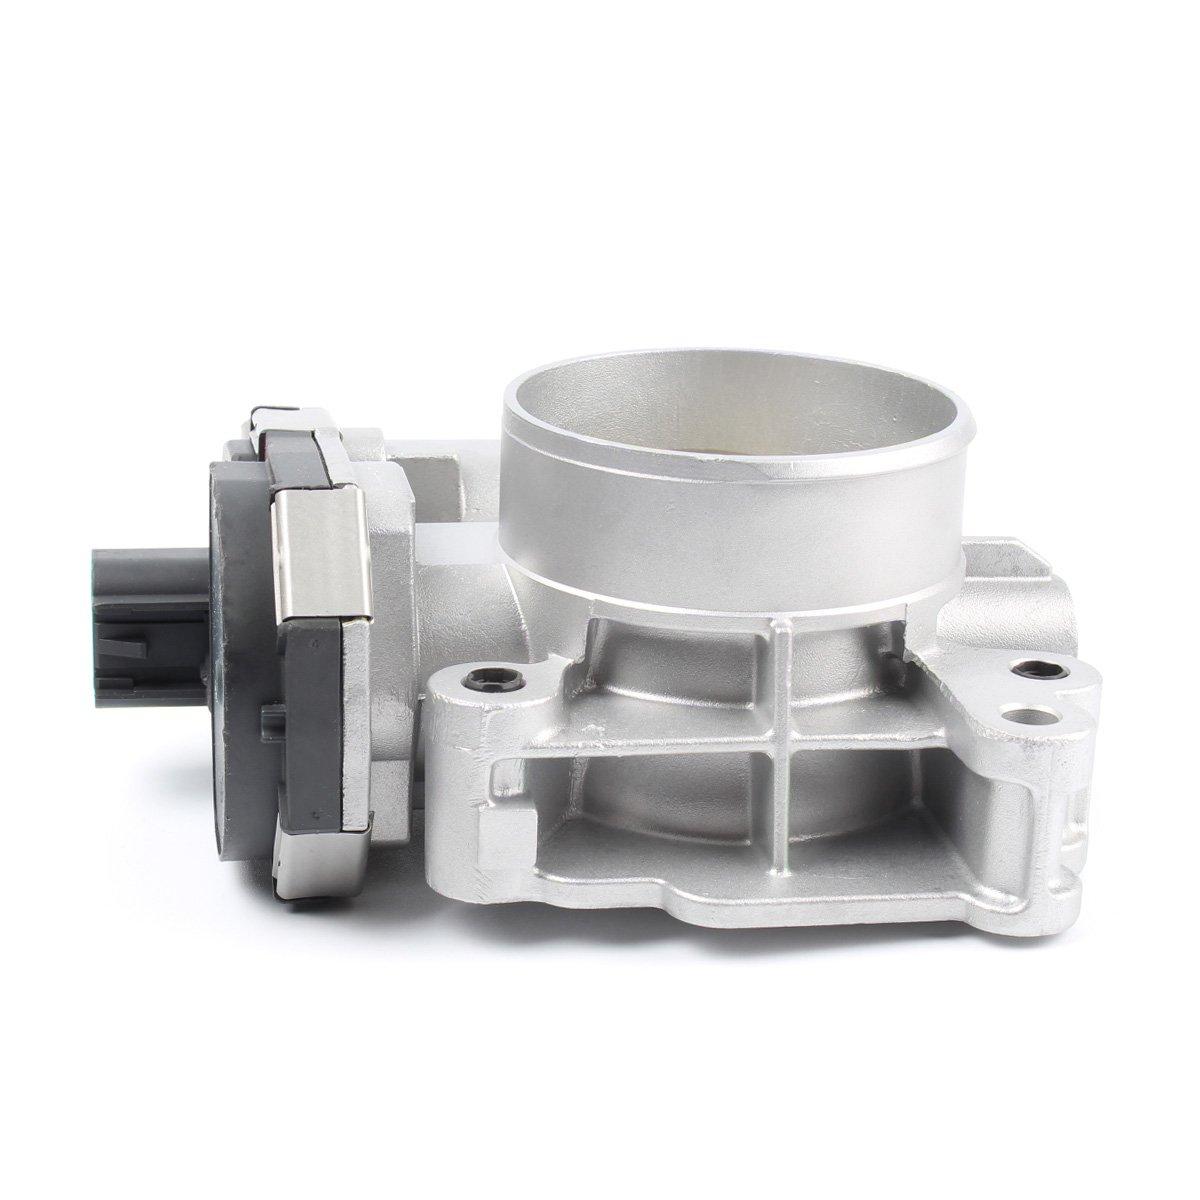 Goodeal Throttle Body For Chevy Pontiac Saturn 22l 08 Hhr Fuel Filter Cobalt G5 Malibu Ion Automotive